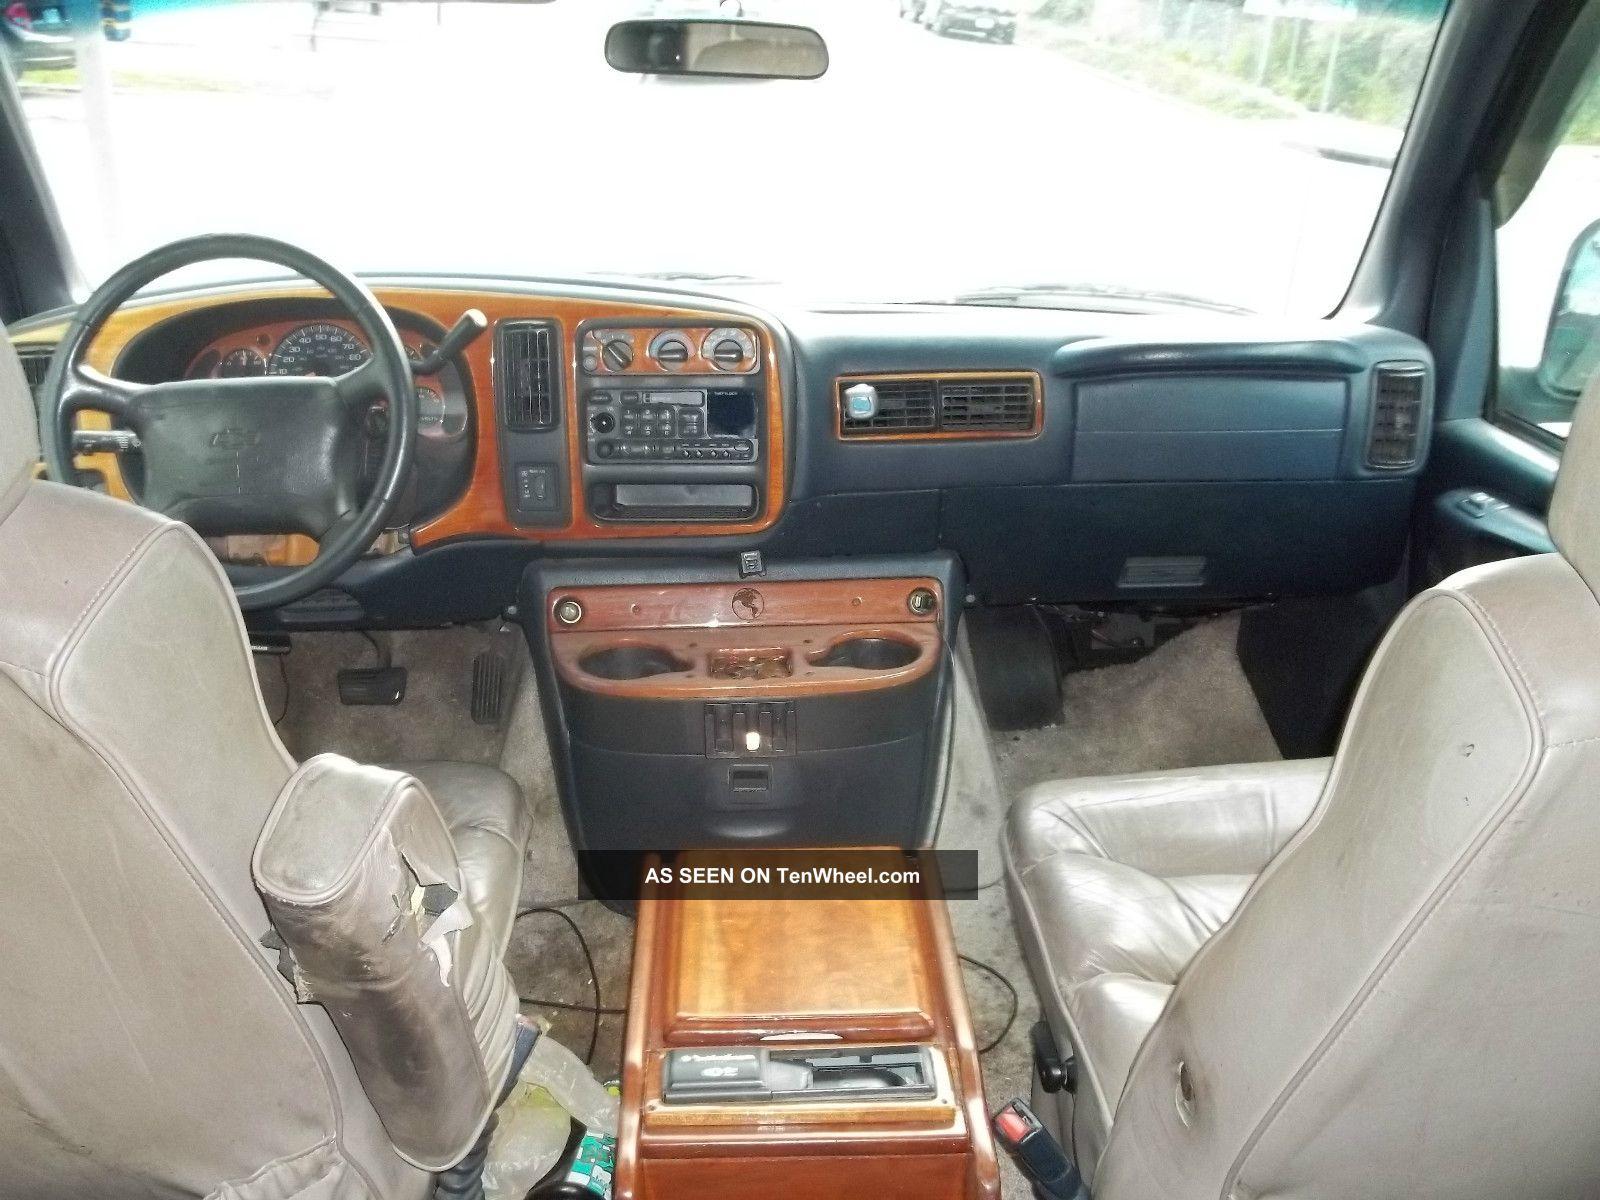 Chevy Express Hi Top Conversion Van Navy Blue Automatic Lgw on 1997 Dodge 1500 Interior